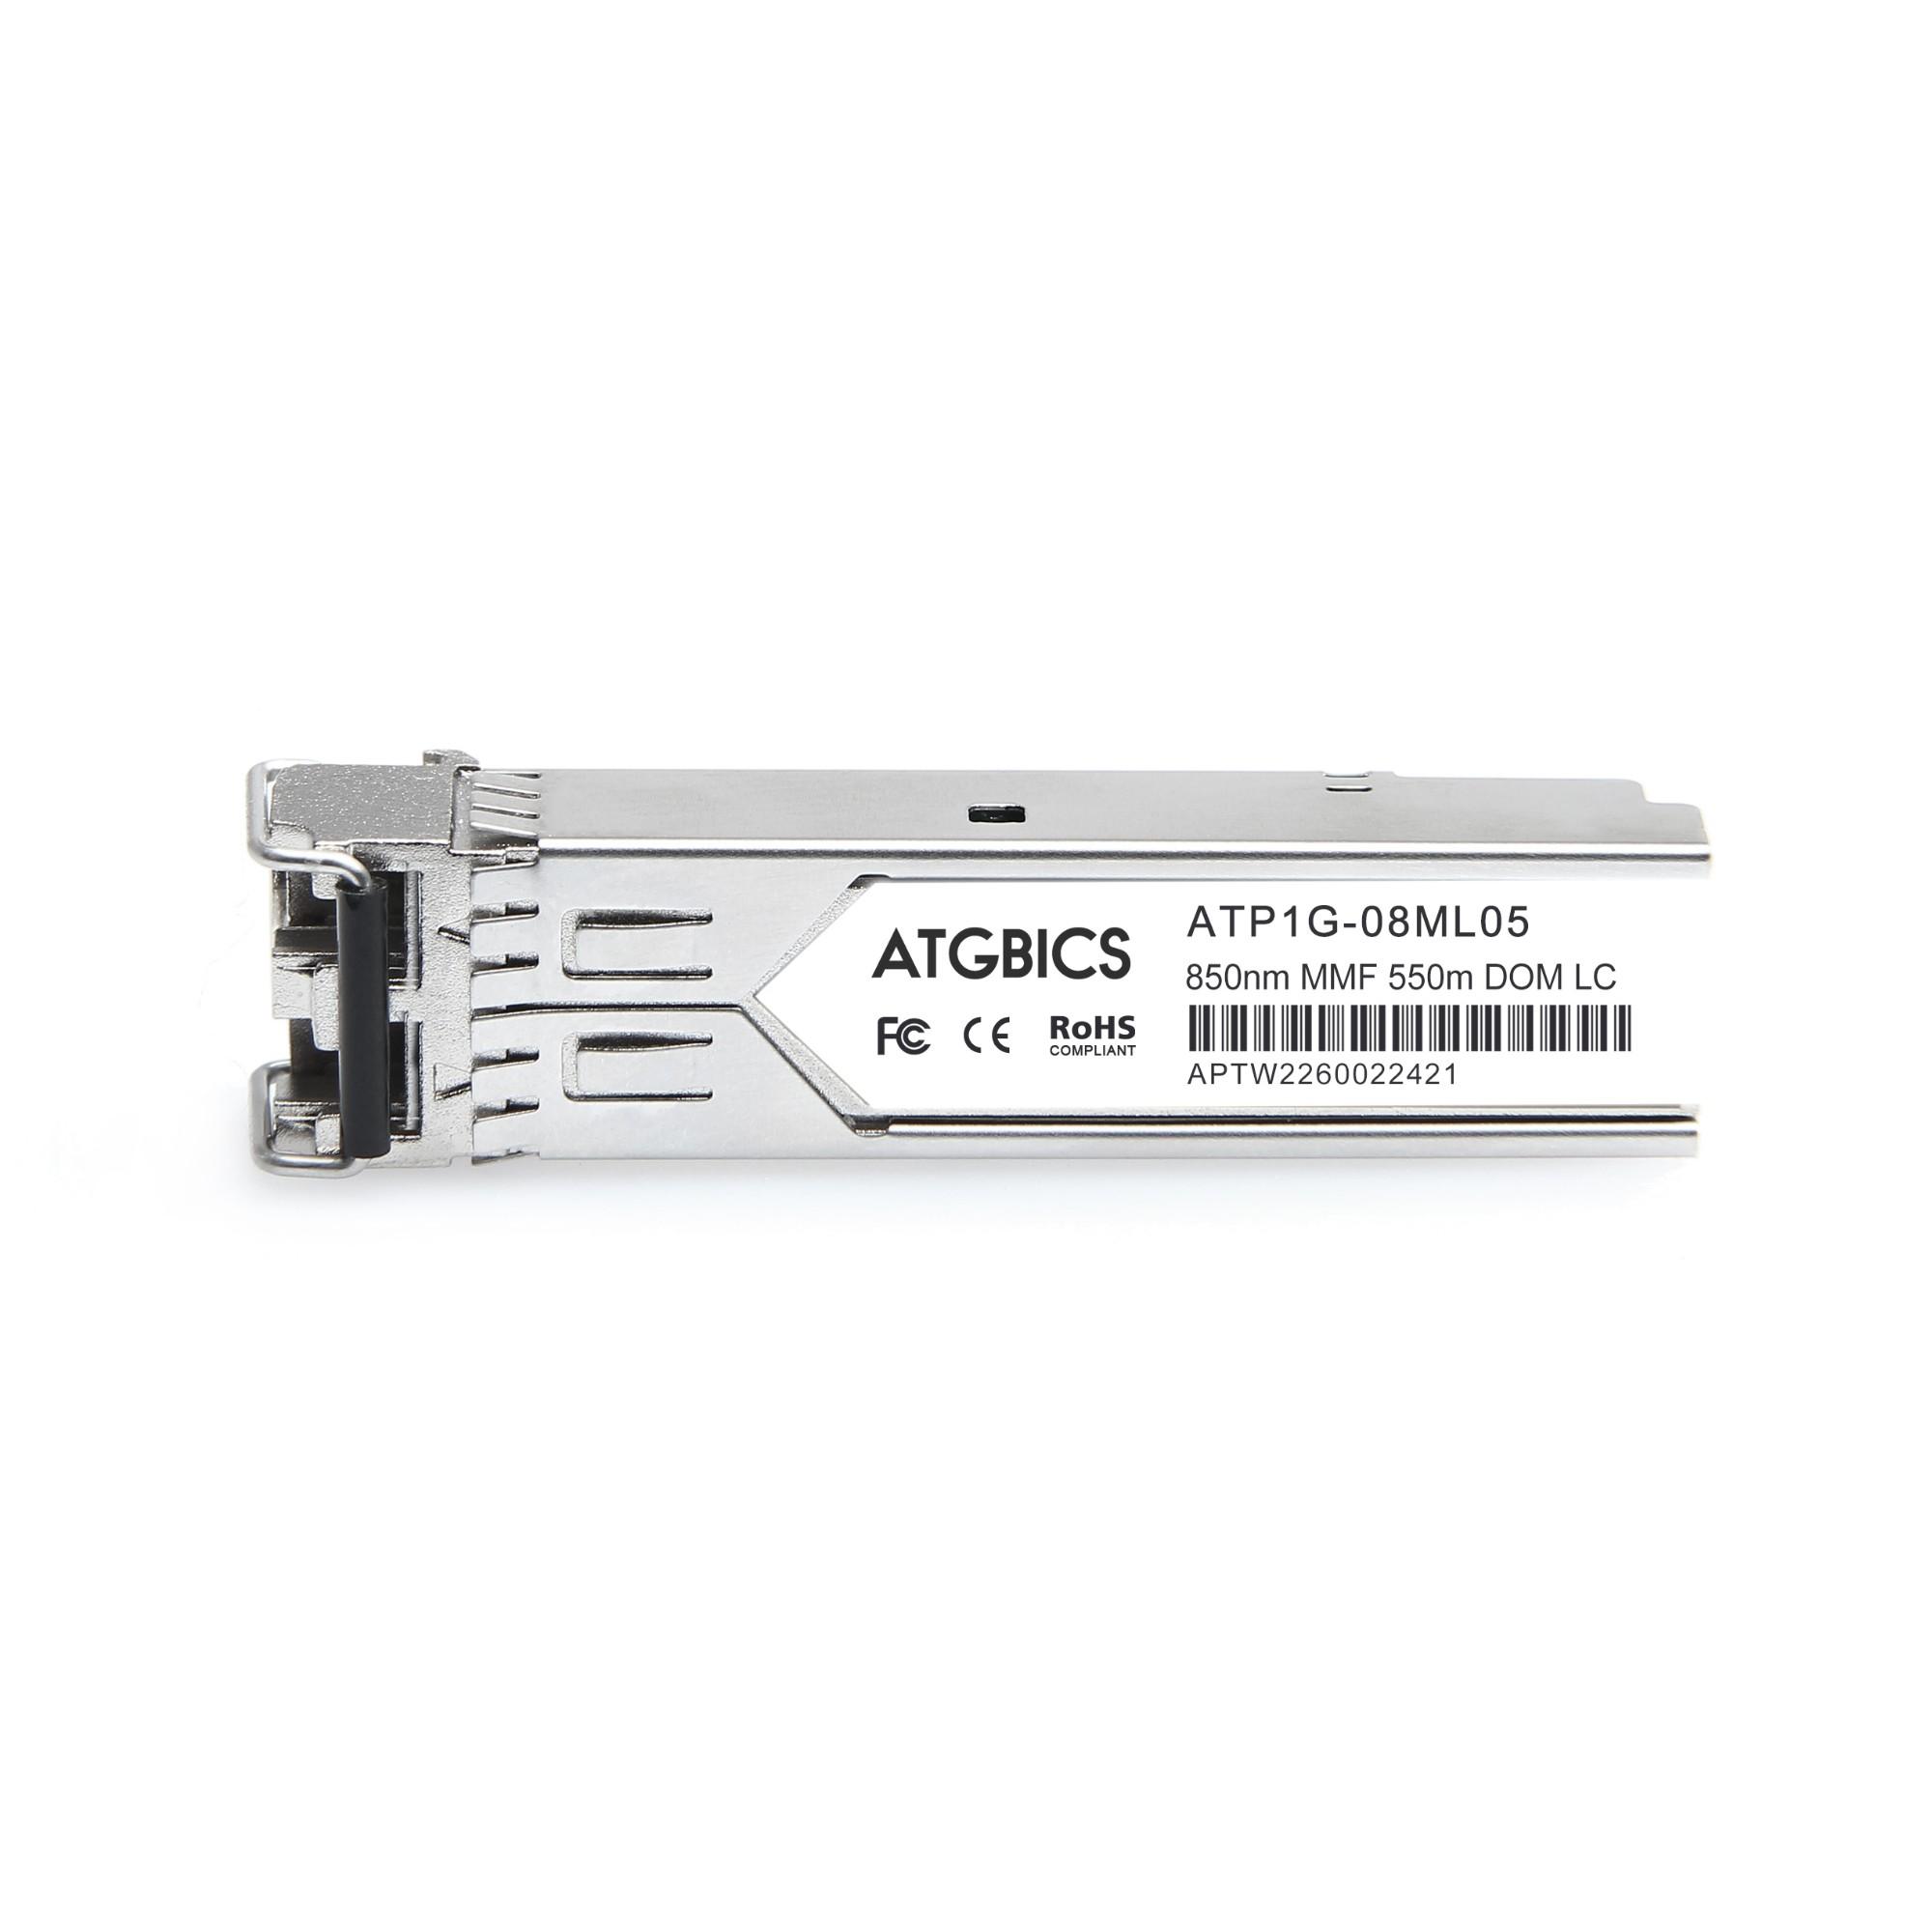 Image of ATGBICS E1MG-SX-OM-8-C network transceiver module Fiber optic 1000 Mbit/s SFP 850 nm